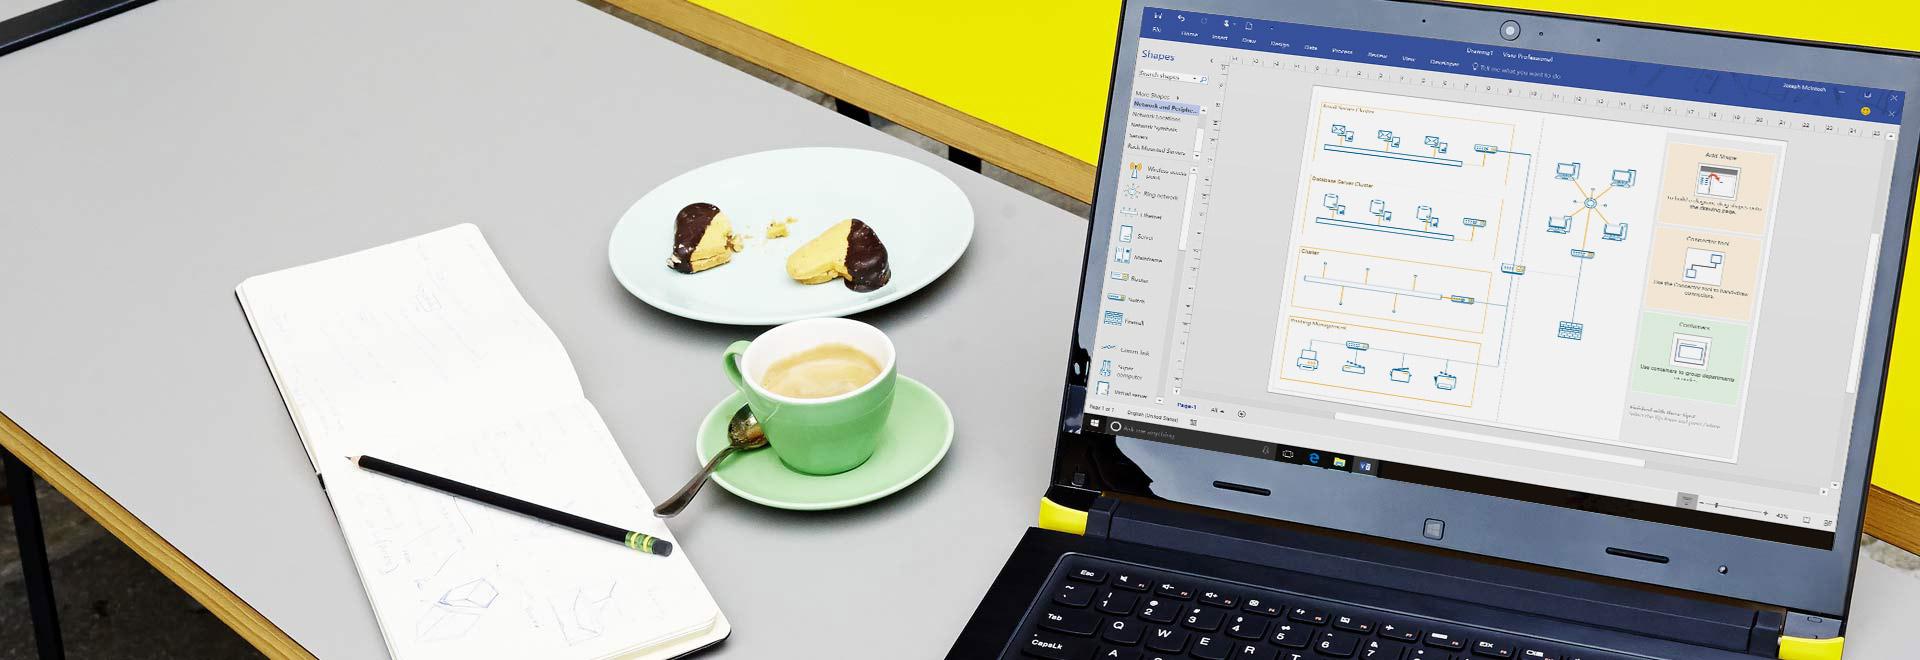 Tangkapan dekat sebuah komputer riba di atas meja, menunjukkan gambar rajah Visio dengan reben dan anak tetingkap pengeditan